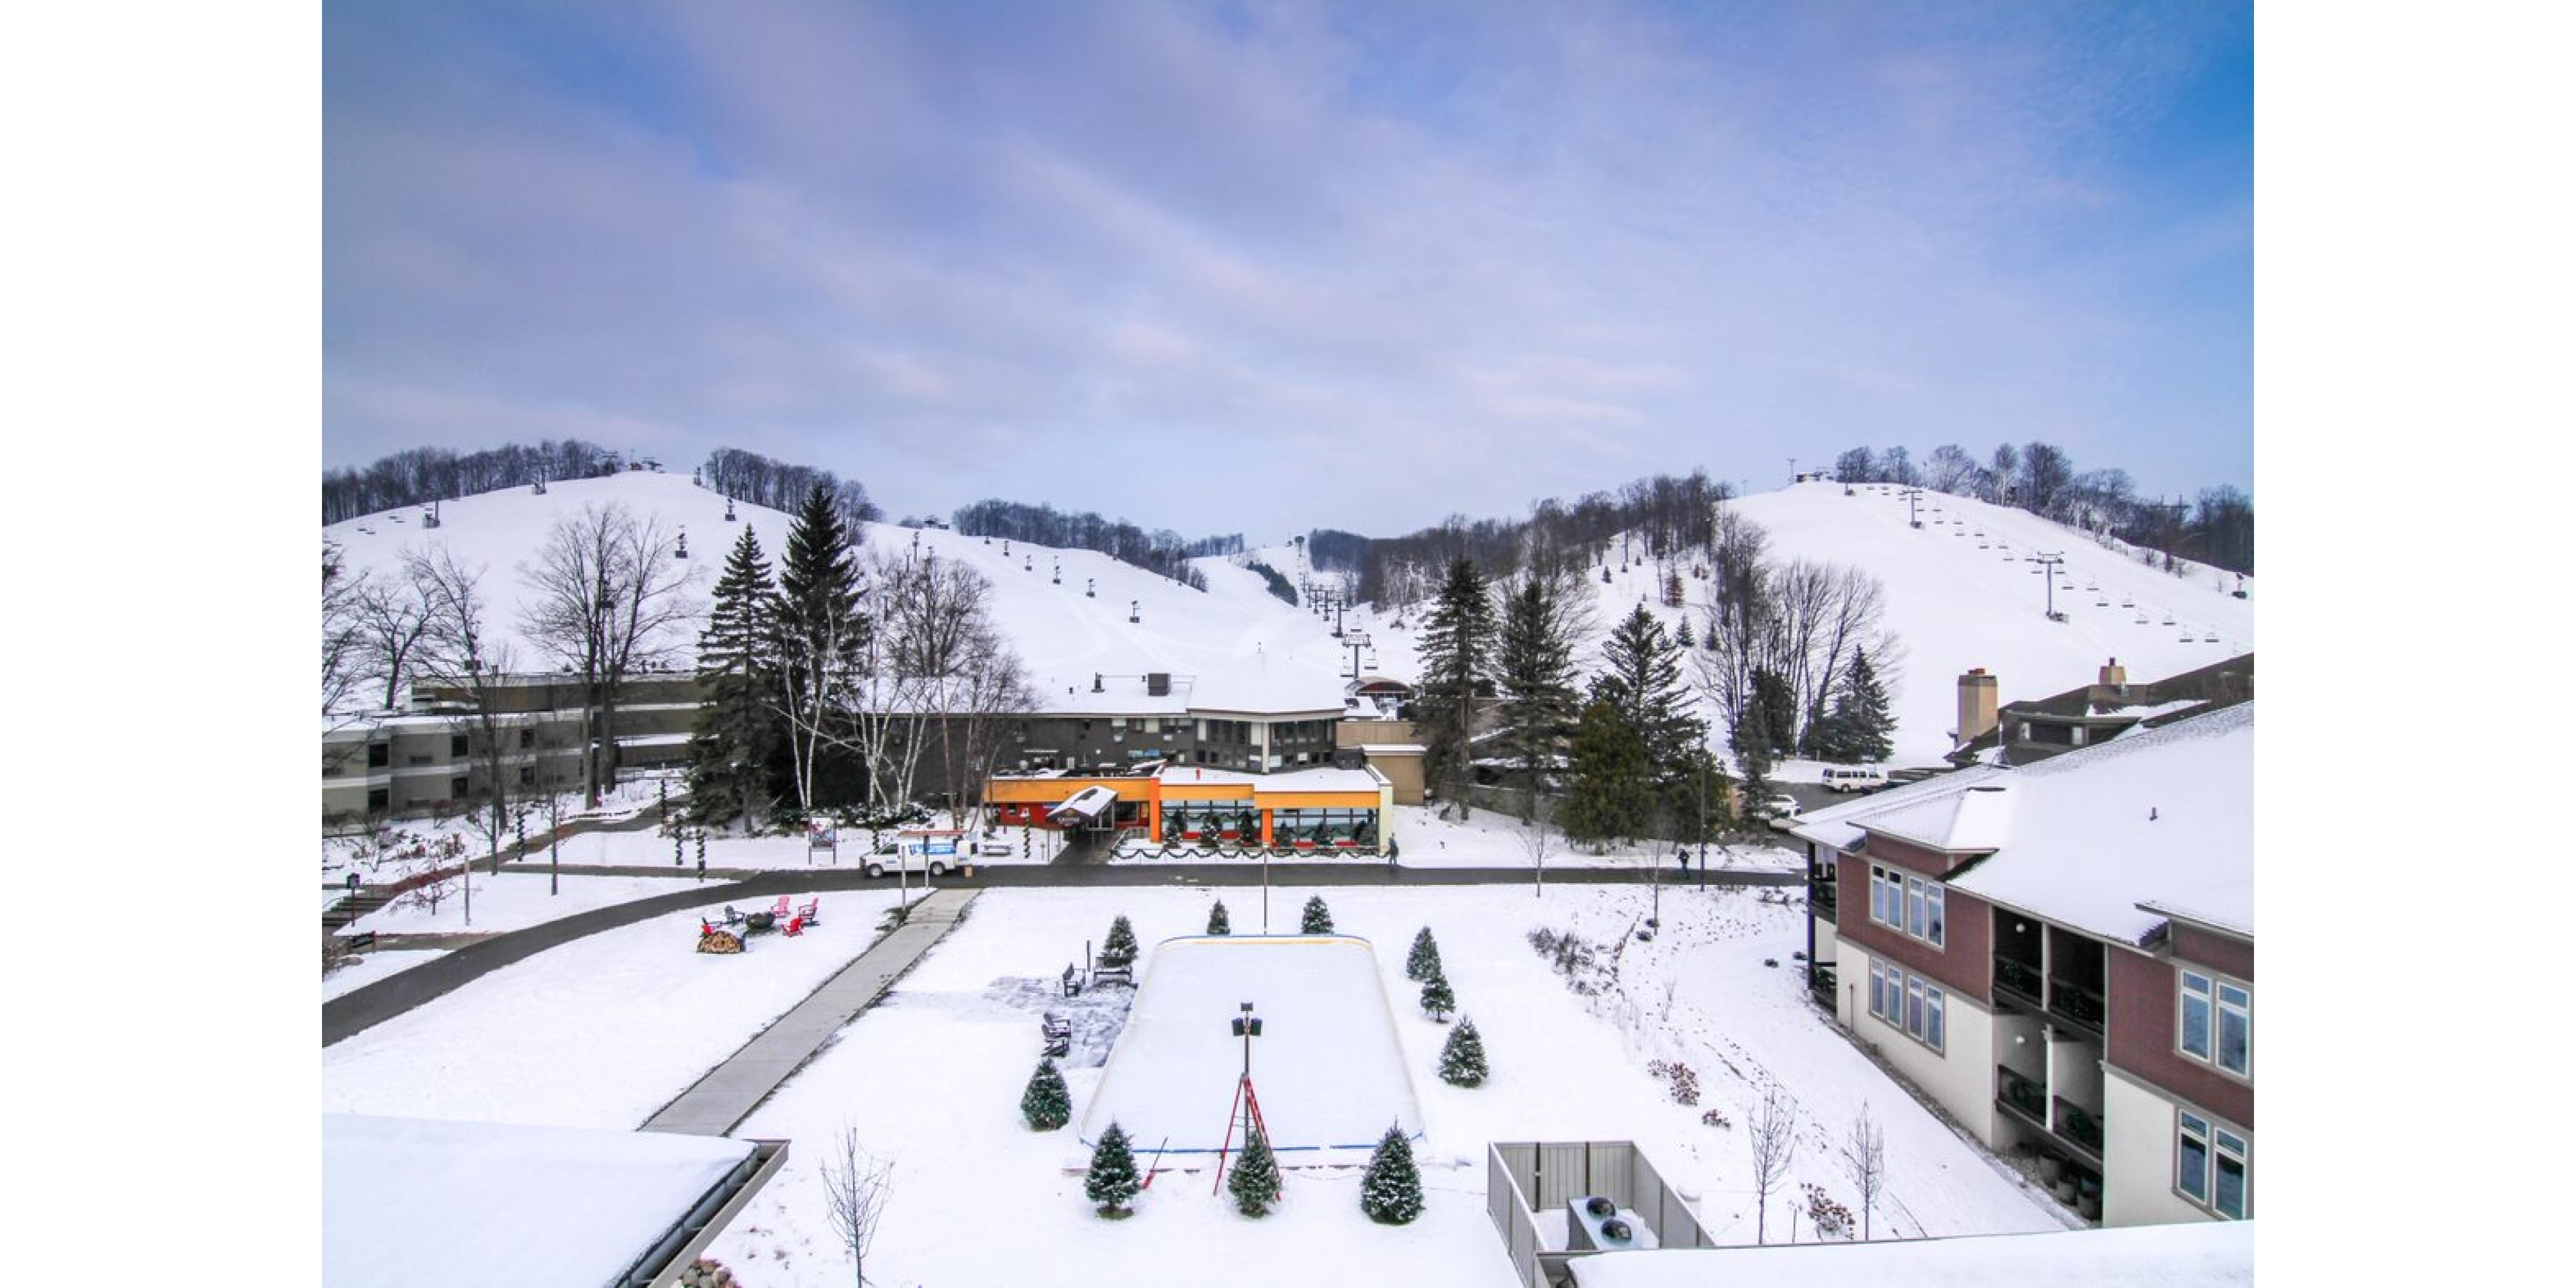 Hotel at Ski Resort